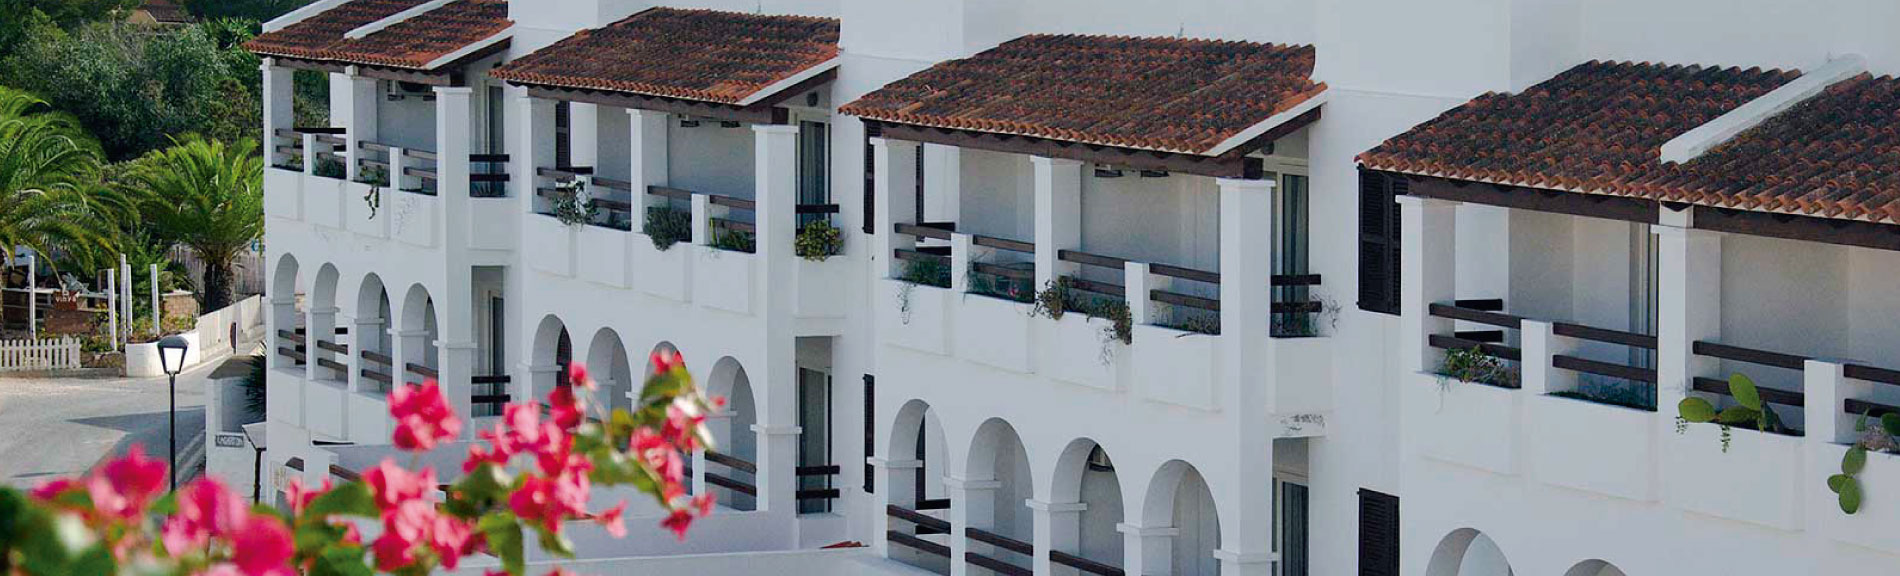 apartamentos en es pujols, formentera | pou des pujols